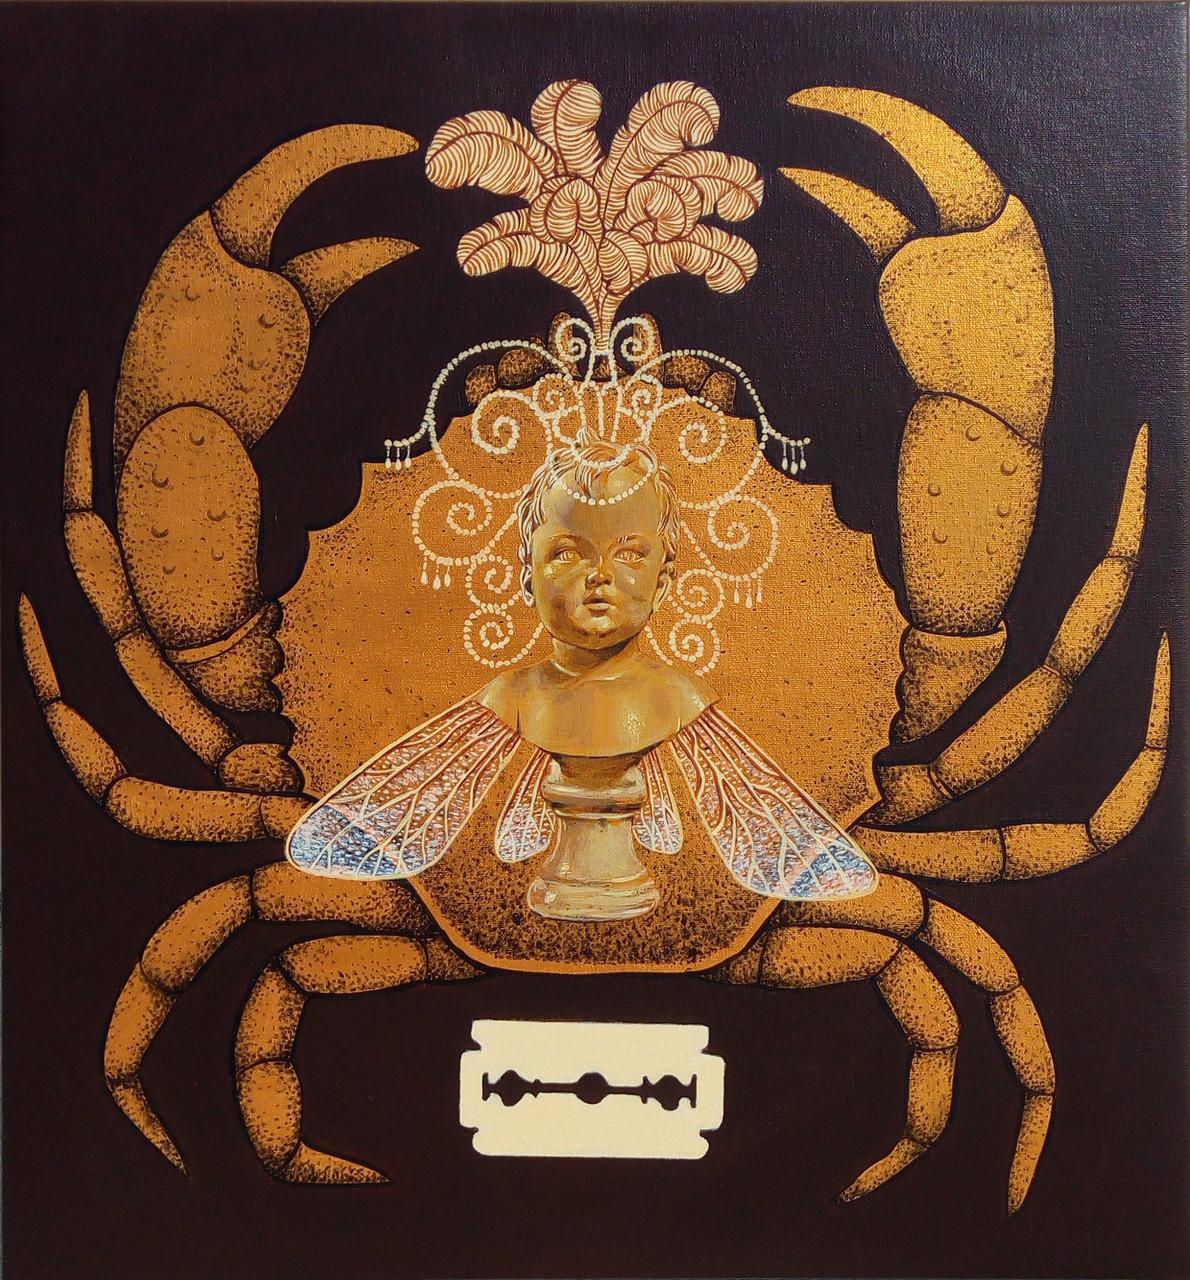 Showgirl, acrylic on canvas,55 x 51 cm